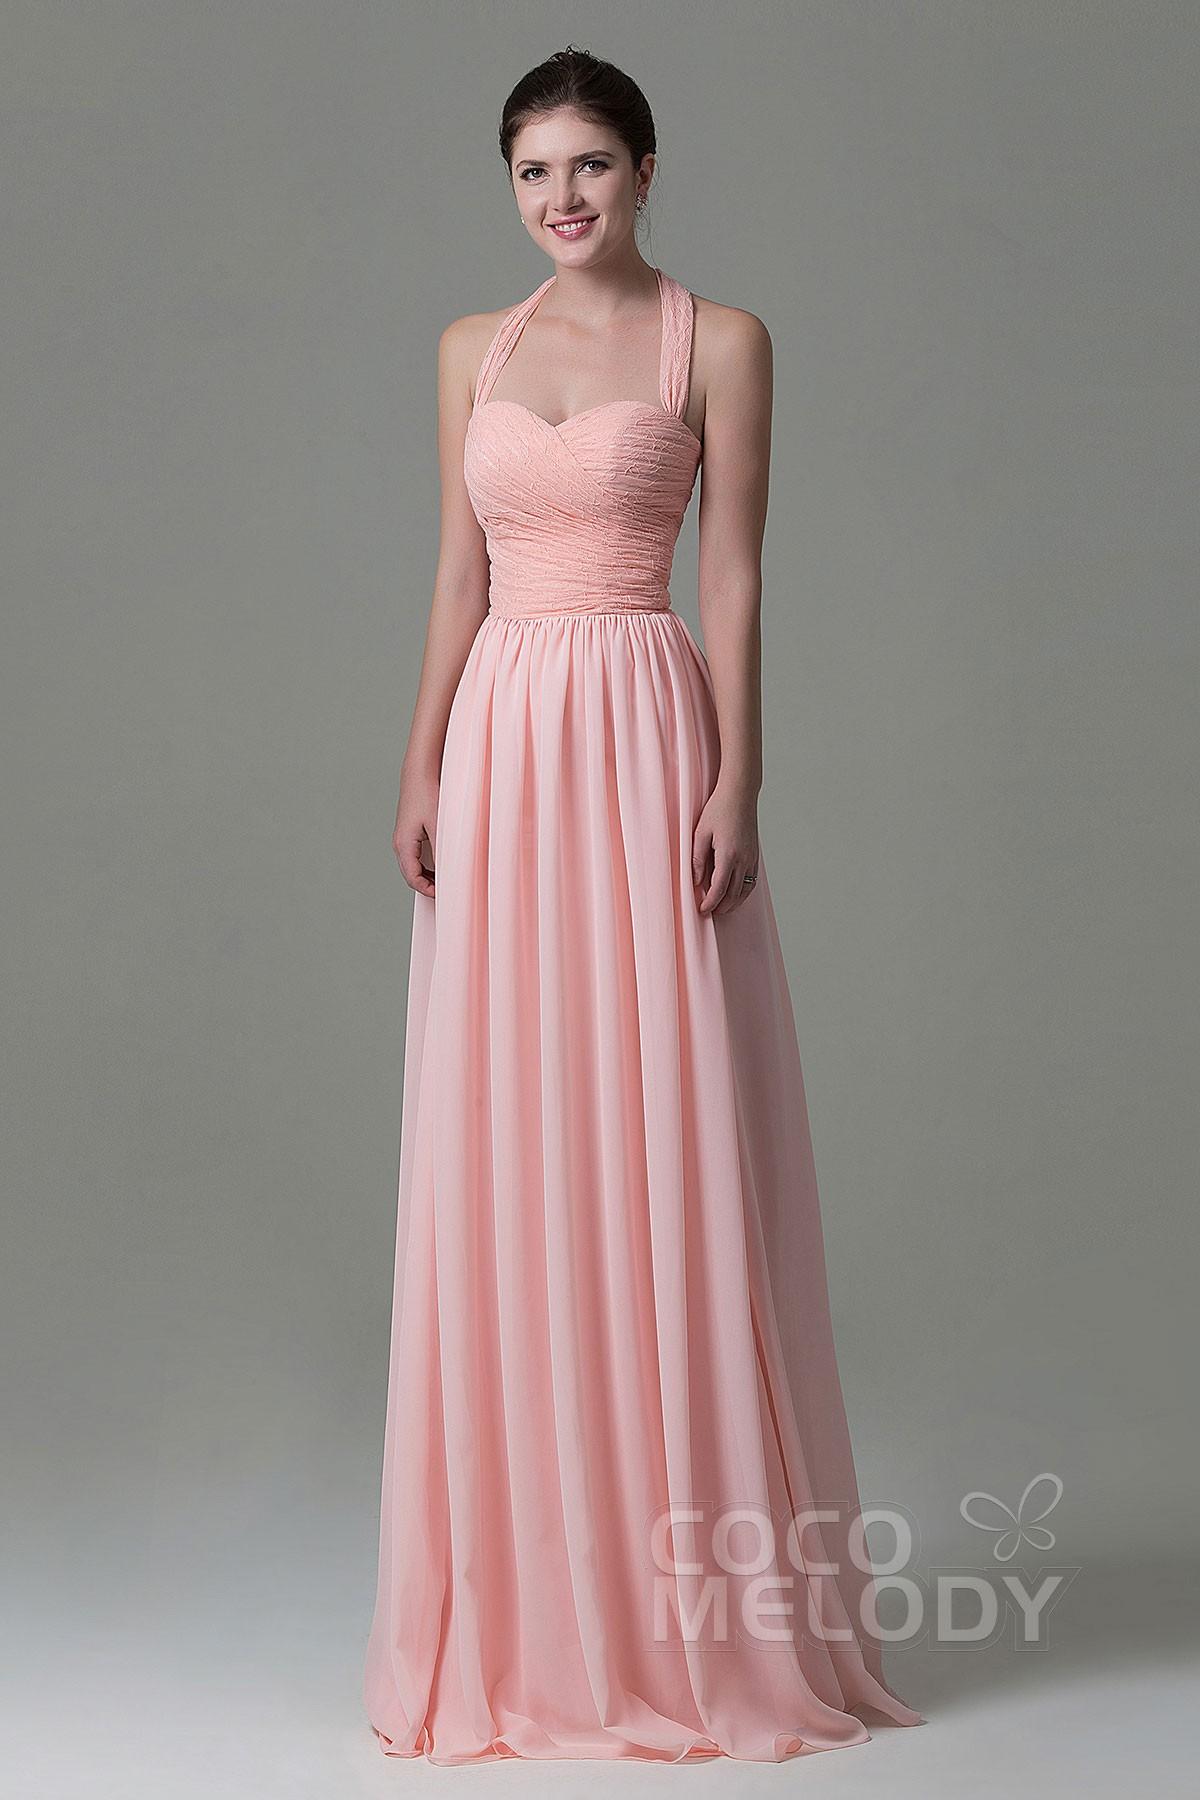 Pretty Sheath-Column Halter Natural Floor Length Lace/Chiffon Veiled Rose Sleeveless Lace Up-Corset Bridesmaid Dress COZK16006